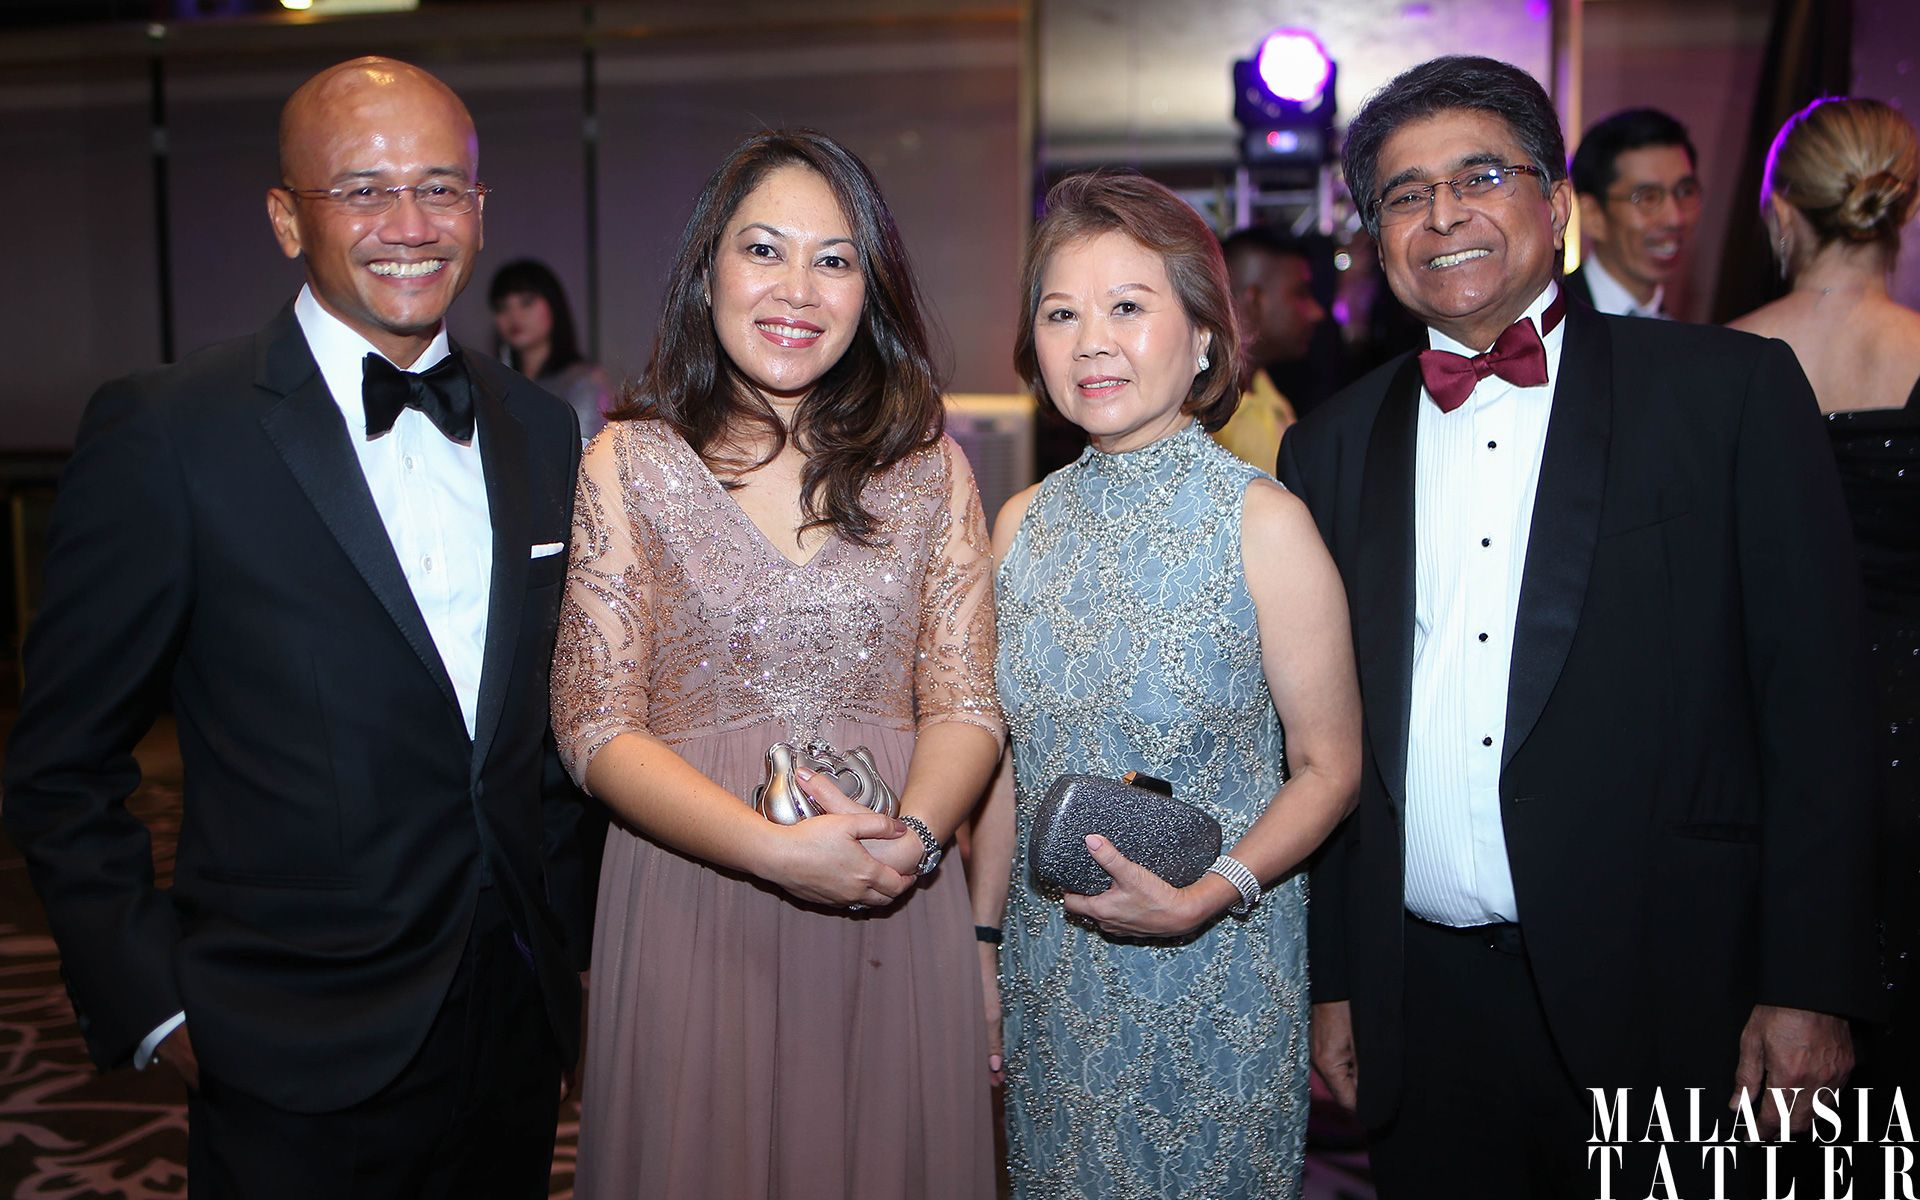 Azran Osman Rani, Azreen Pharmy, Datin Sri Joyce Raymond and Dato' Sri Jeffrey Raymond